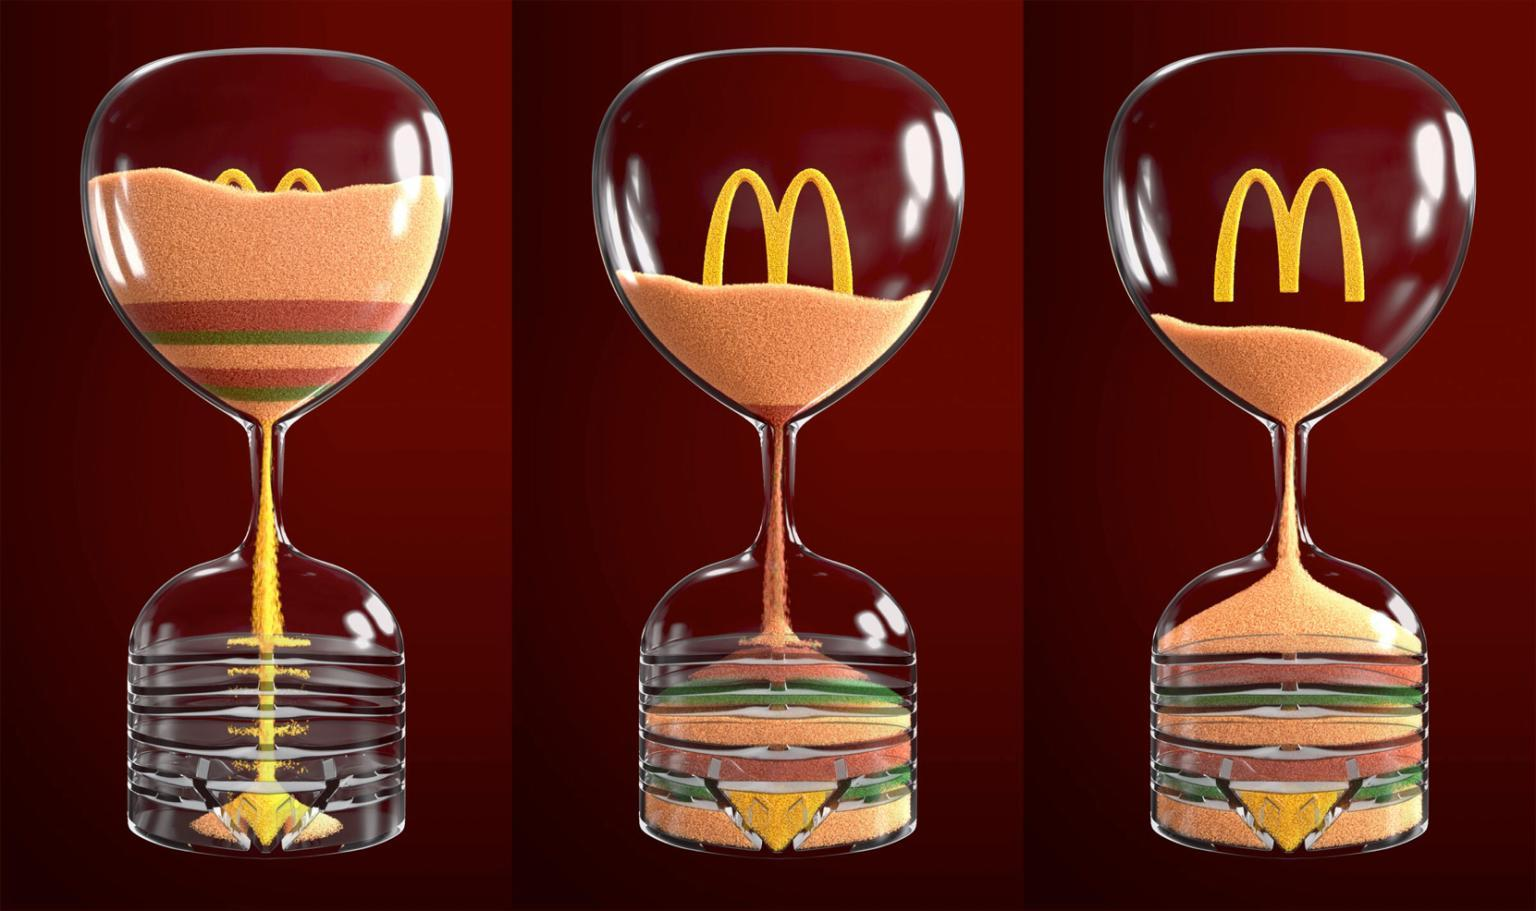 McDonald's in Arabia Saudita-clessidra-ramadan